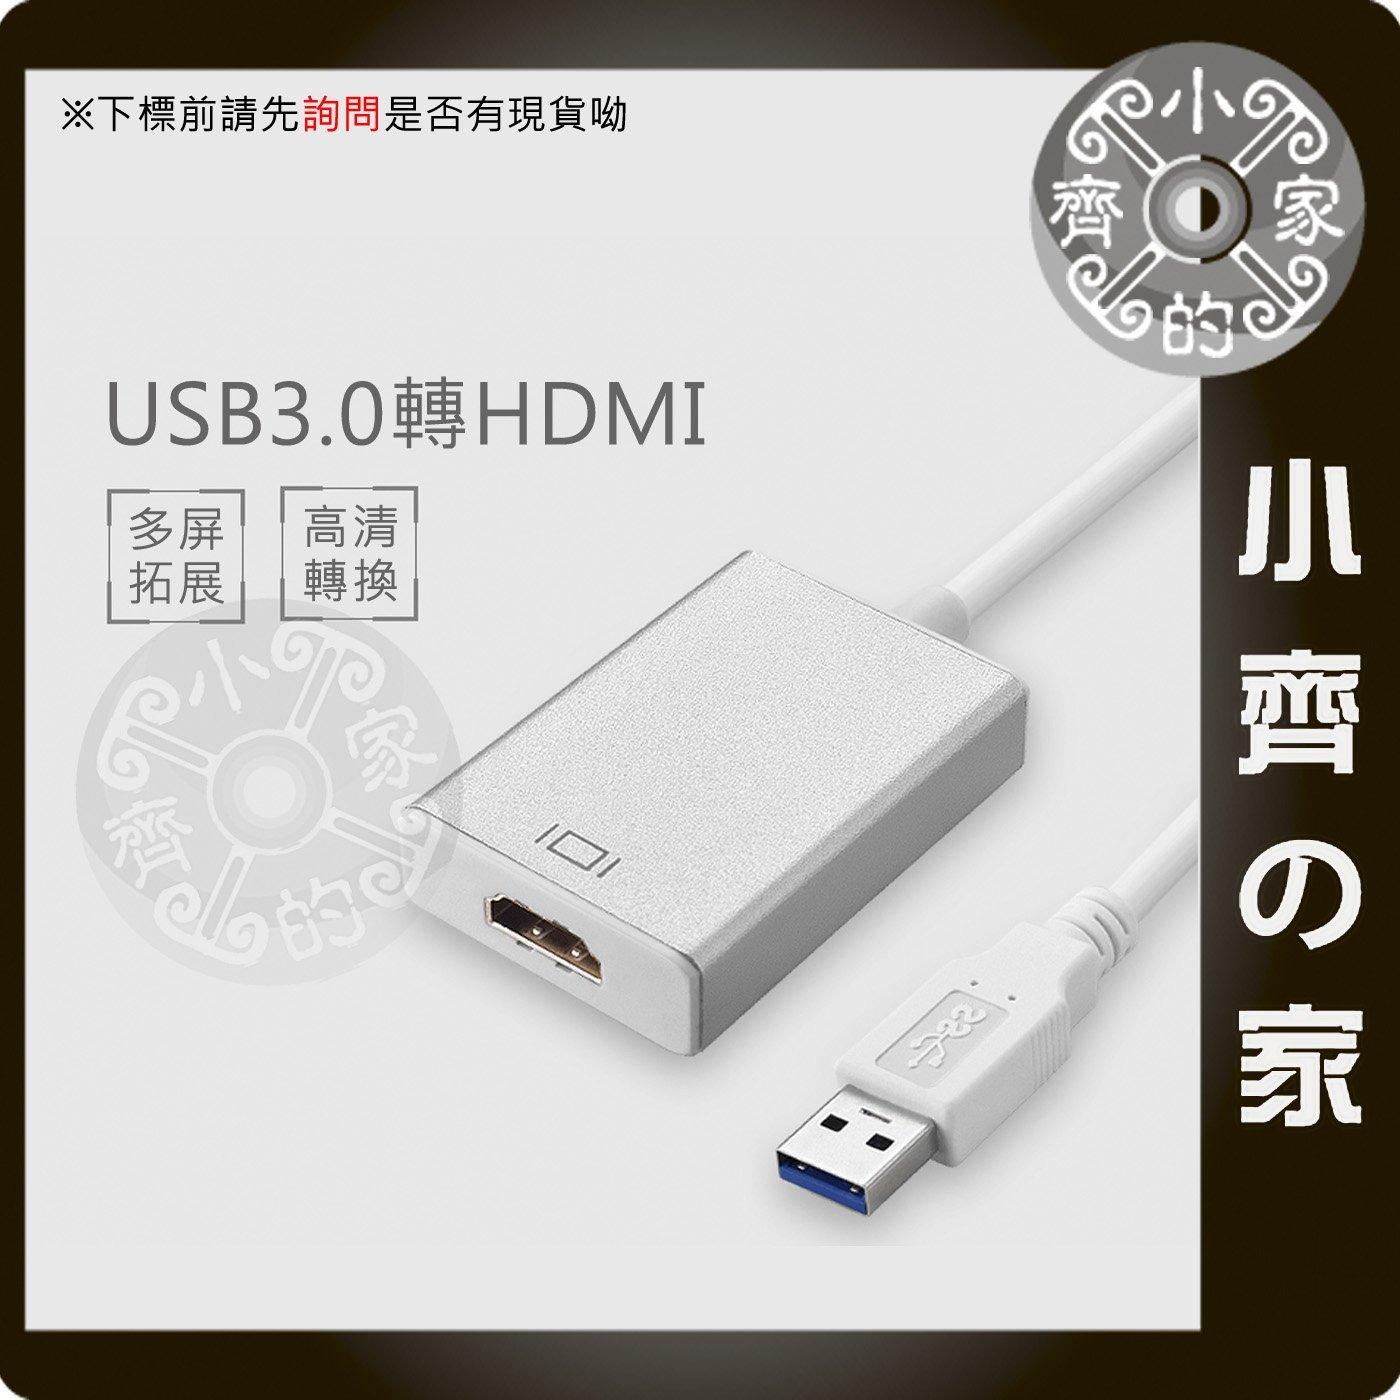 USB 3.0 TO HDMI USB轉HDMI轉換線 外接顯卡 電腦 筆電 螢幕 電視 同步顯示 小齊的家